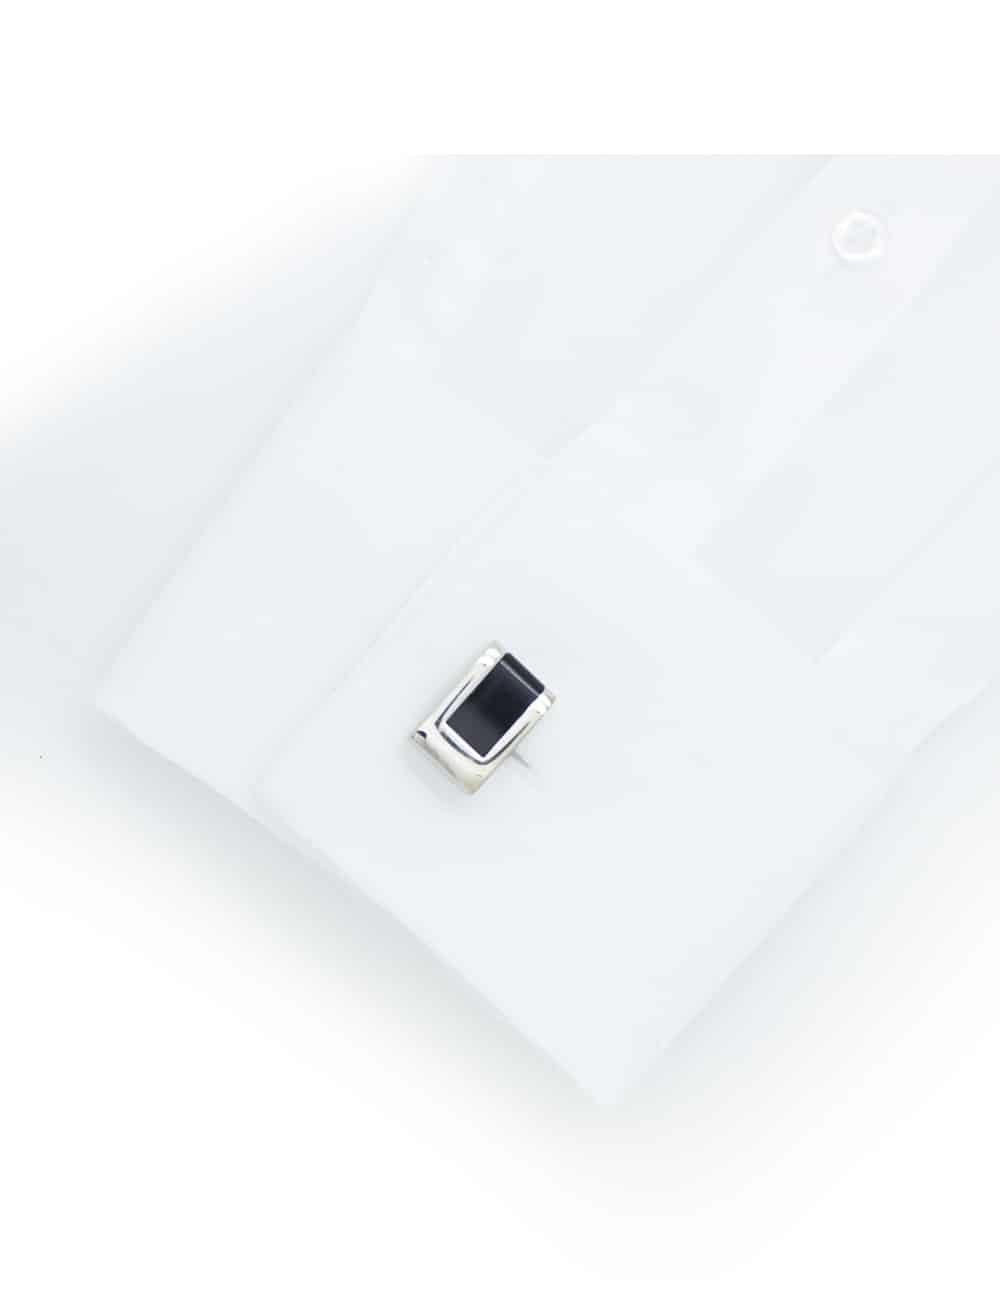 Chrome silver rectangle black enamel tile cufflink 0300-077